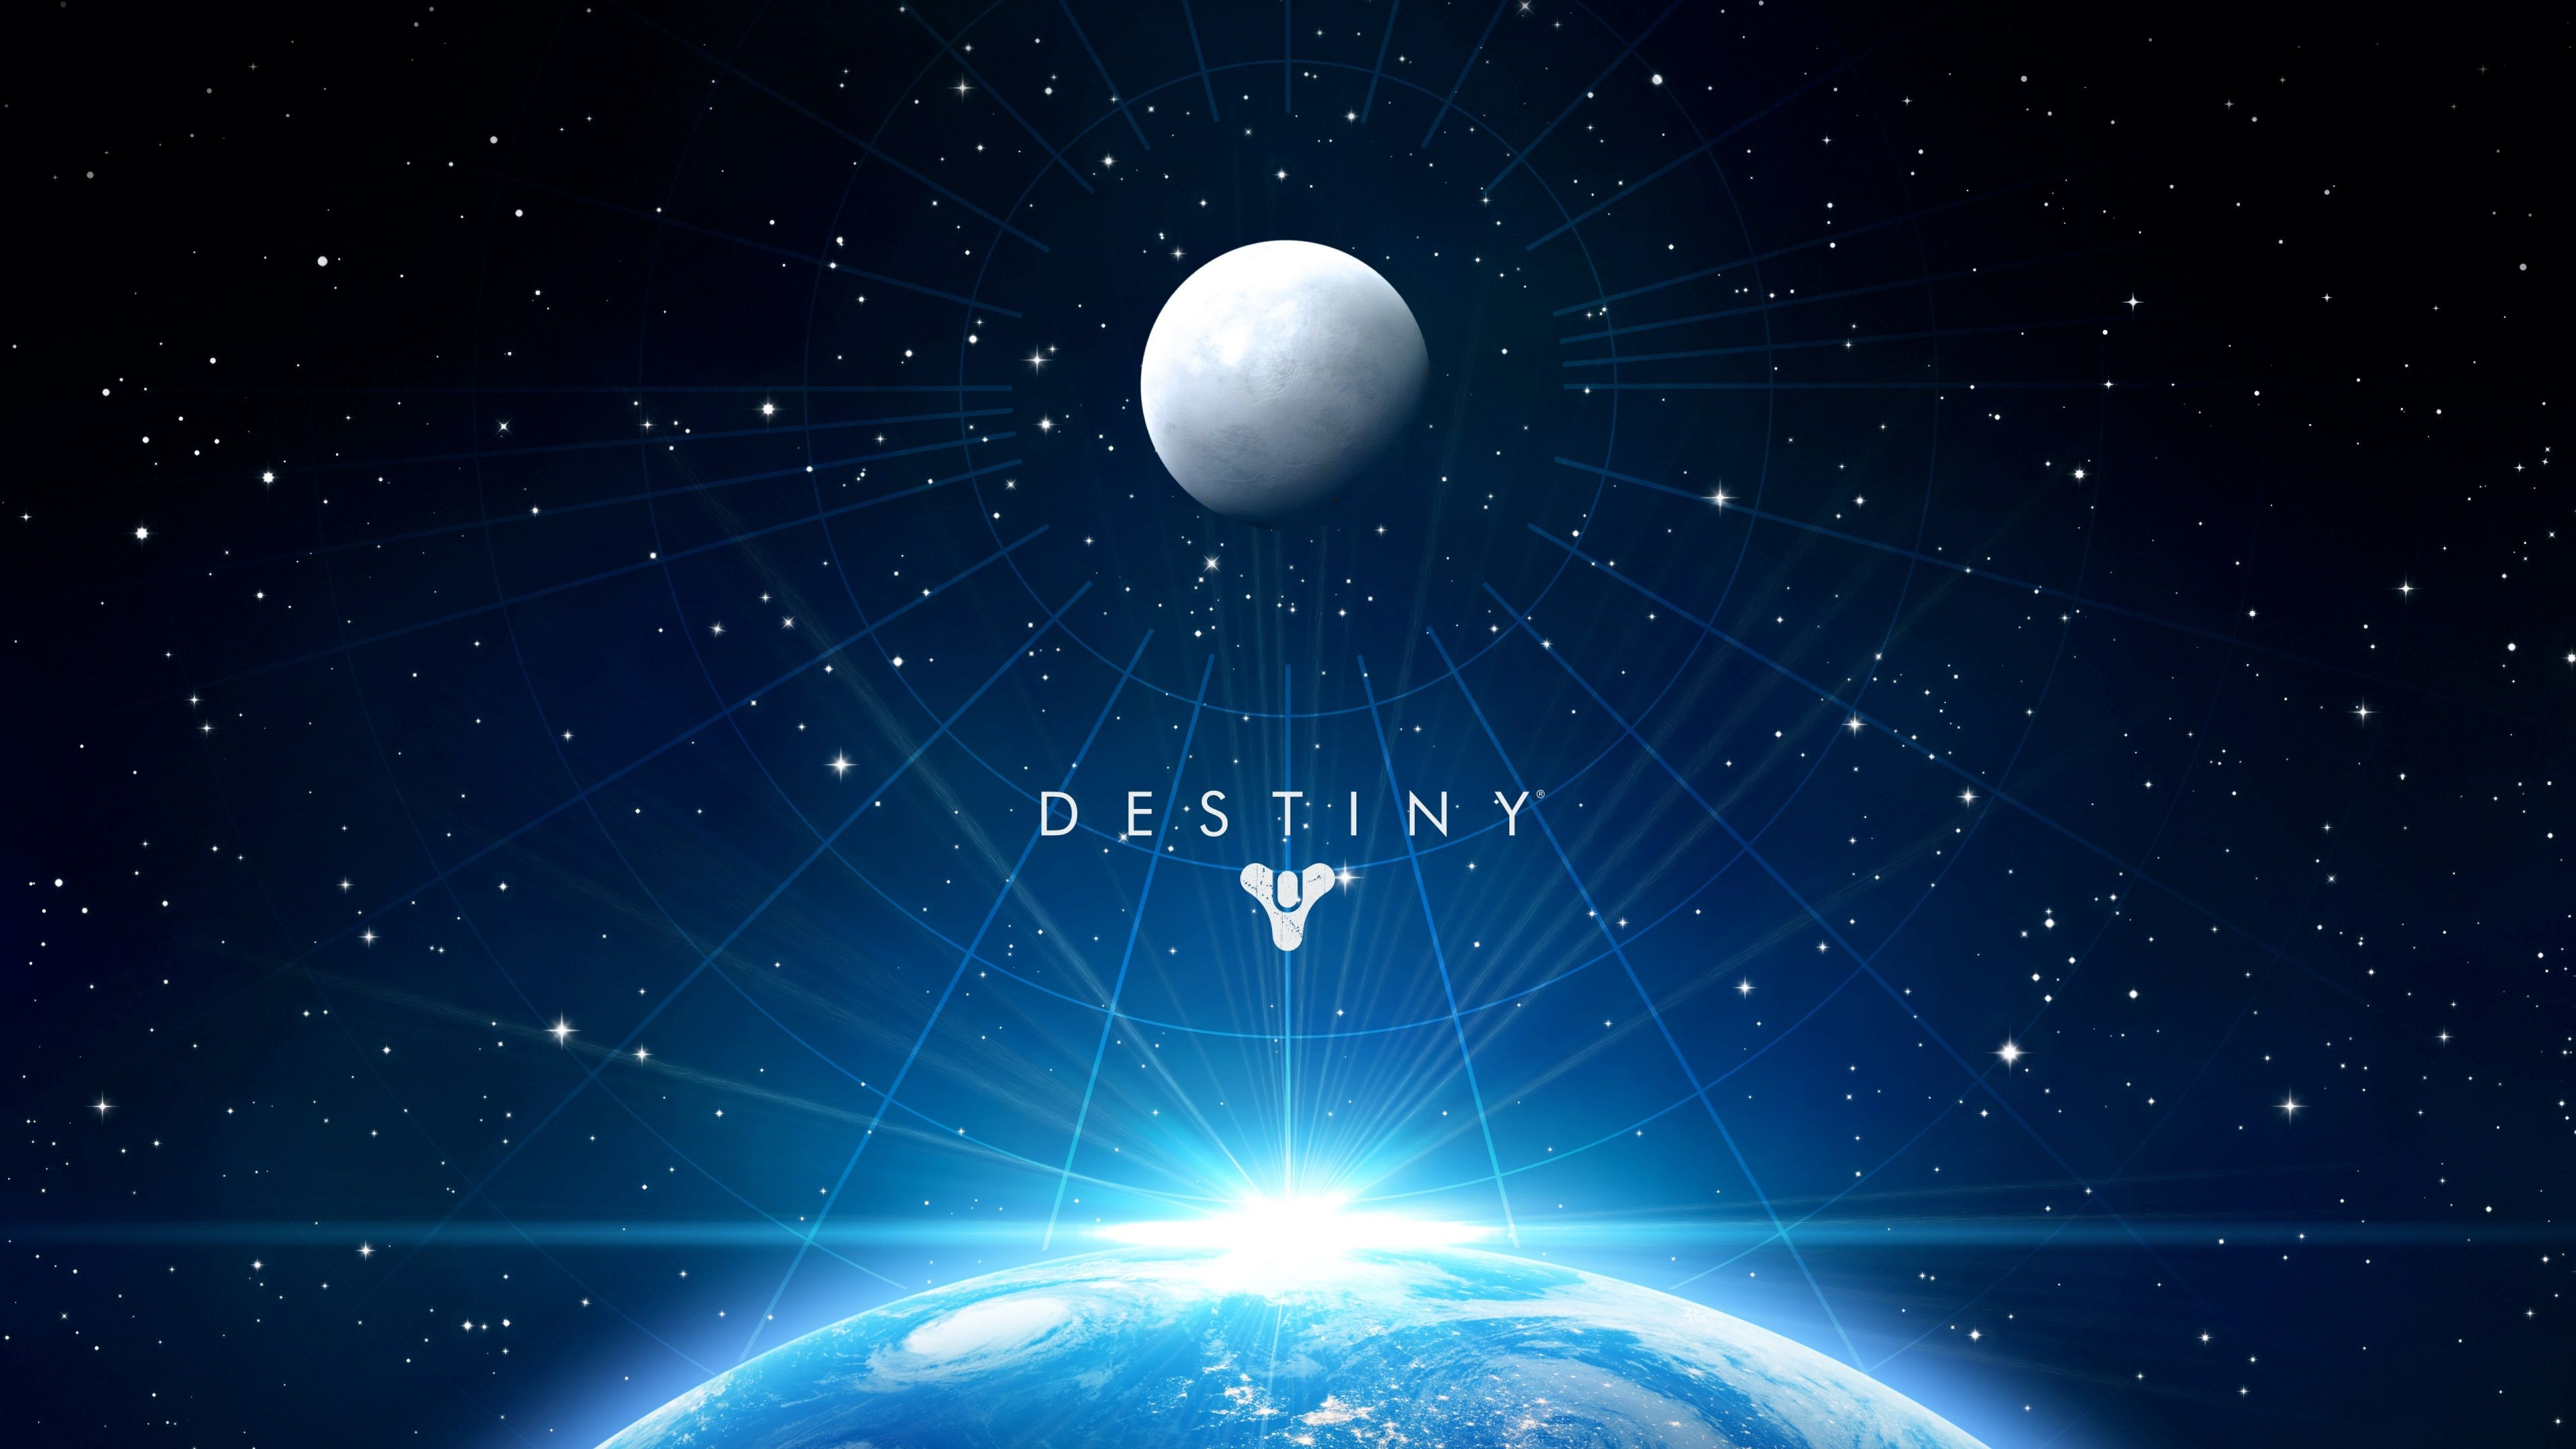 3840x2160 Destiny 4k Hd Image For Wallpaper Destiny Game Destiny Wallpaper Hd Destiny Backgrounds